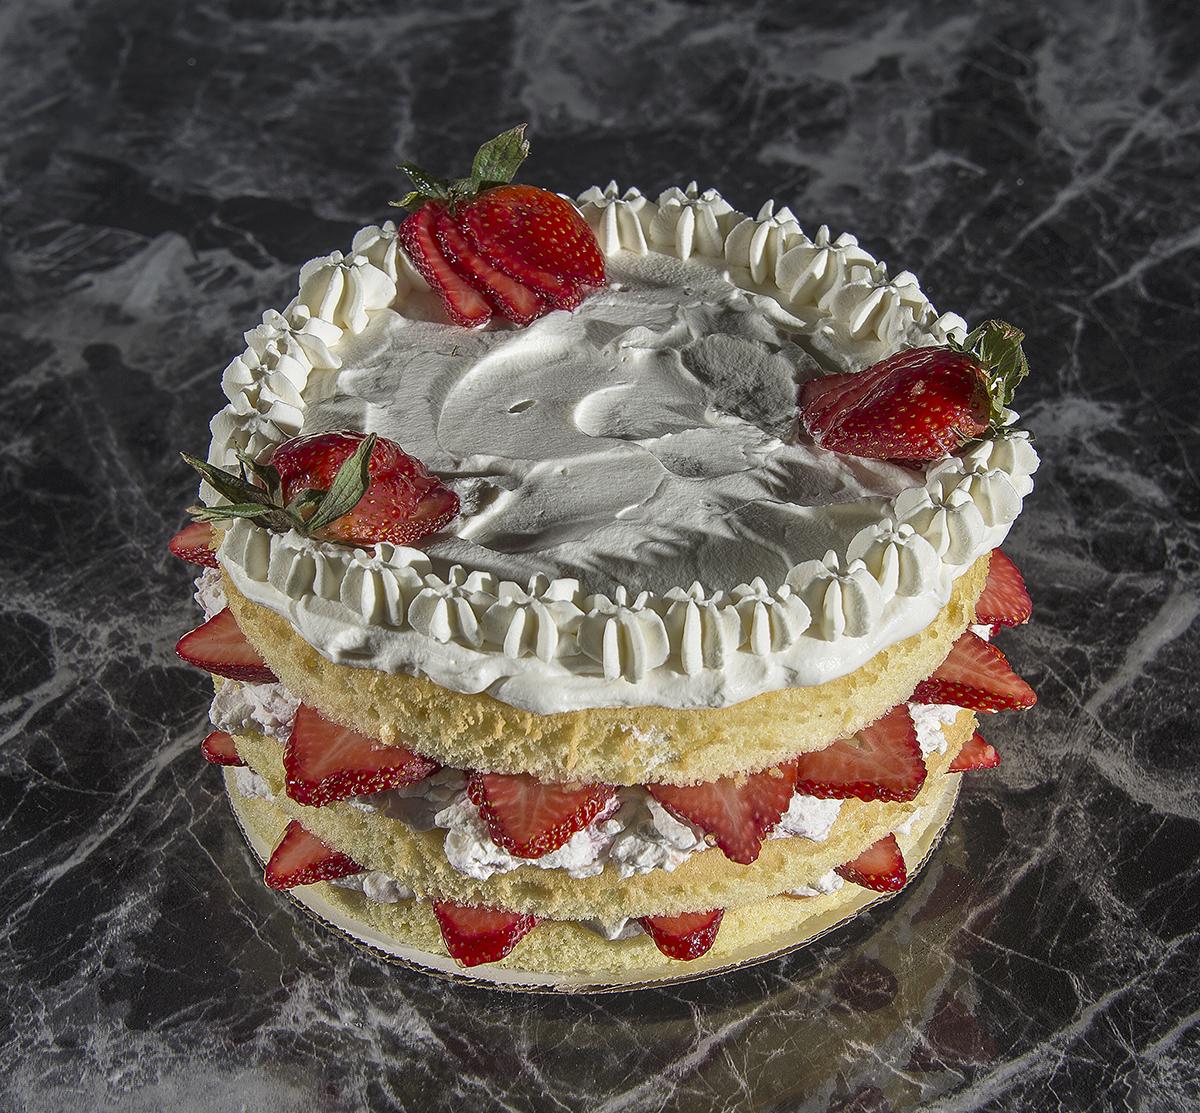 Dagmars Desserts